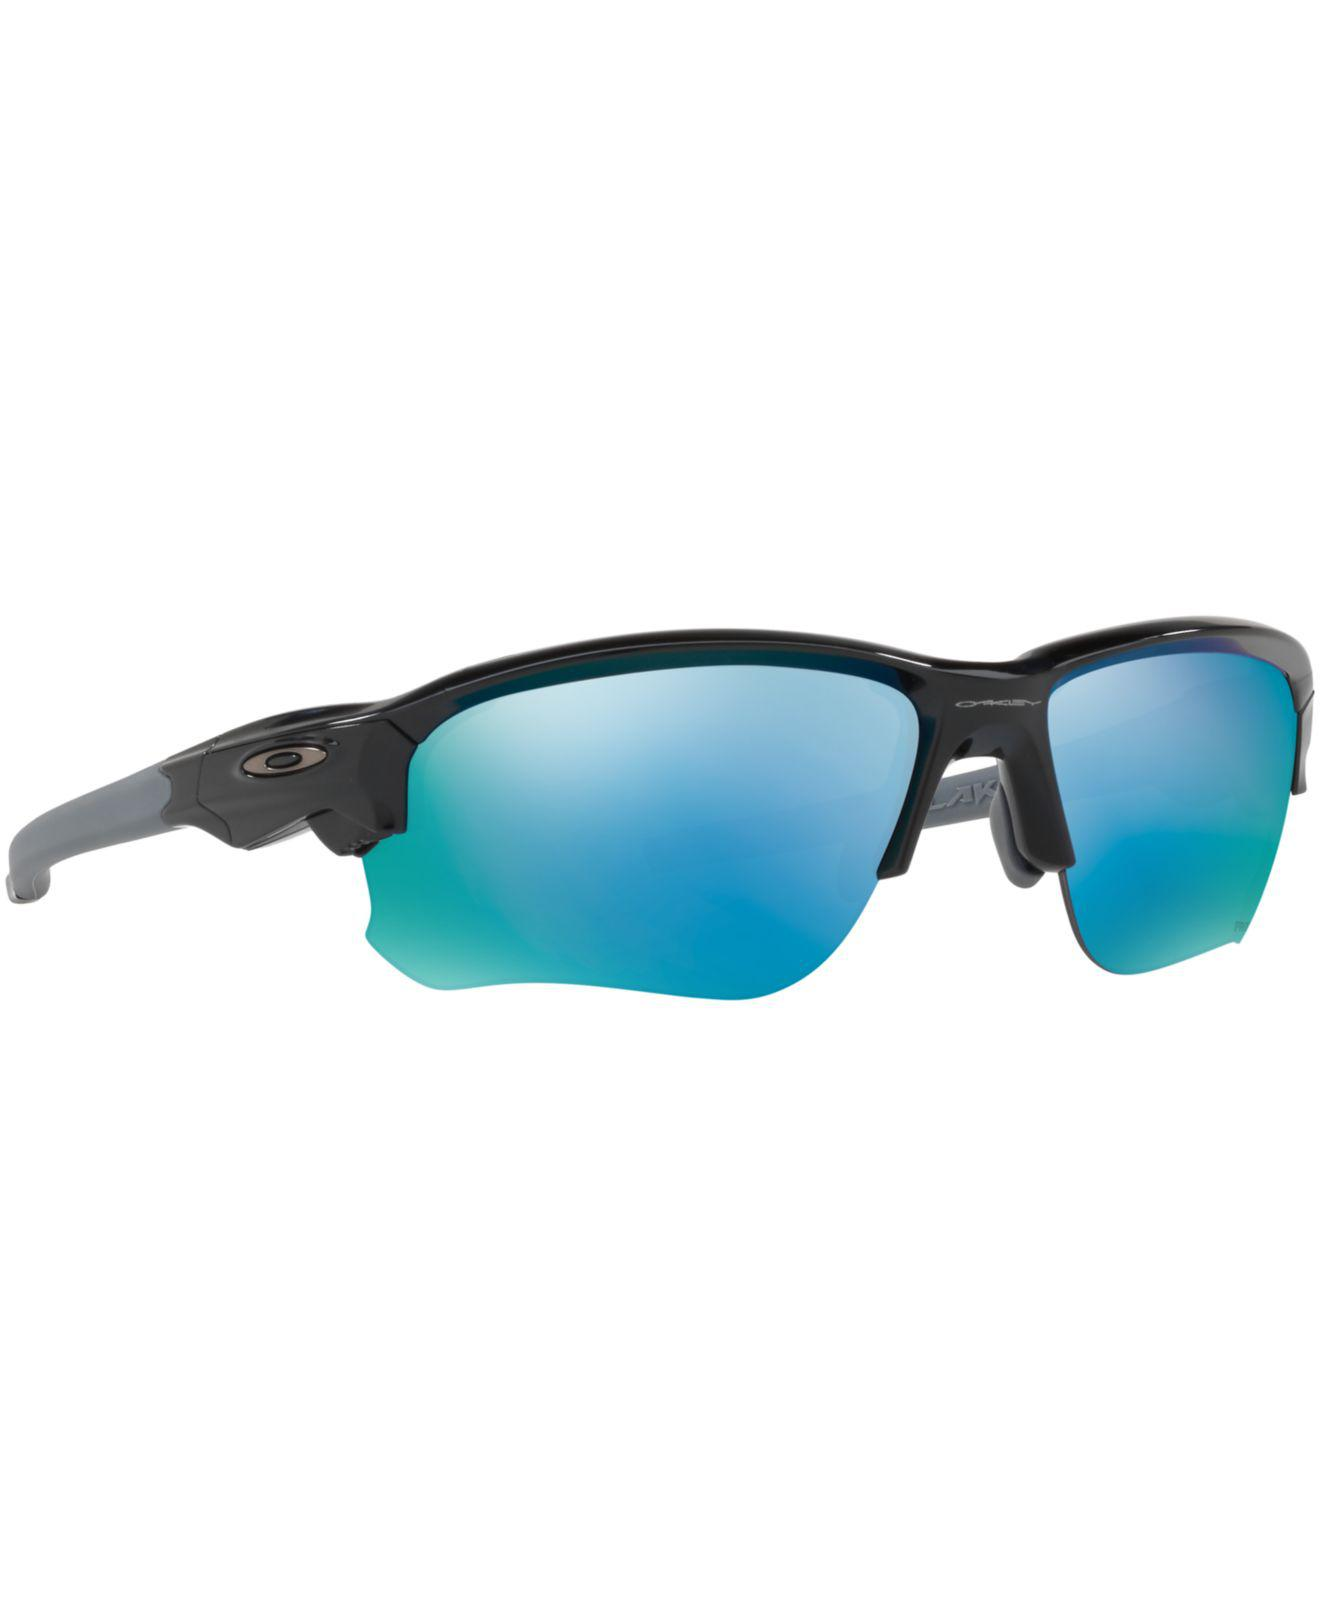 59f2f39535a Oakley - Multicolor Flak Draft Prizm Deep Water Sunglasses